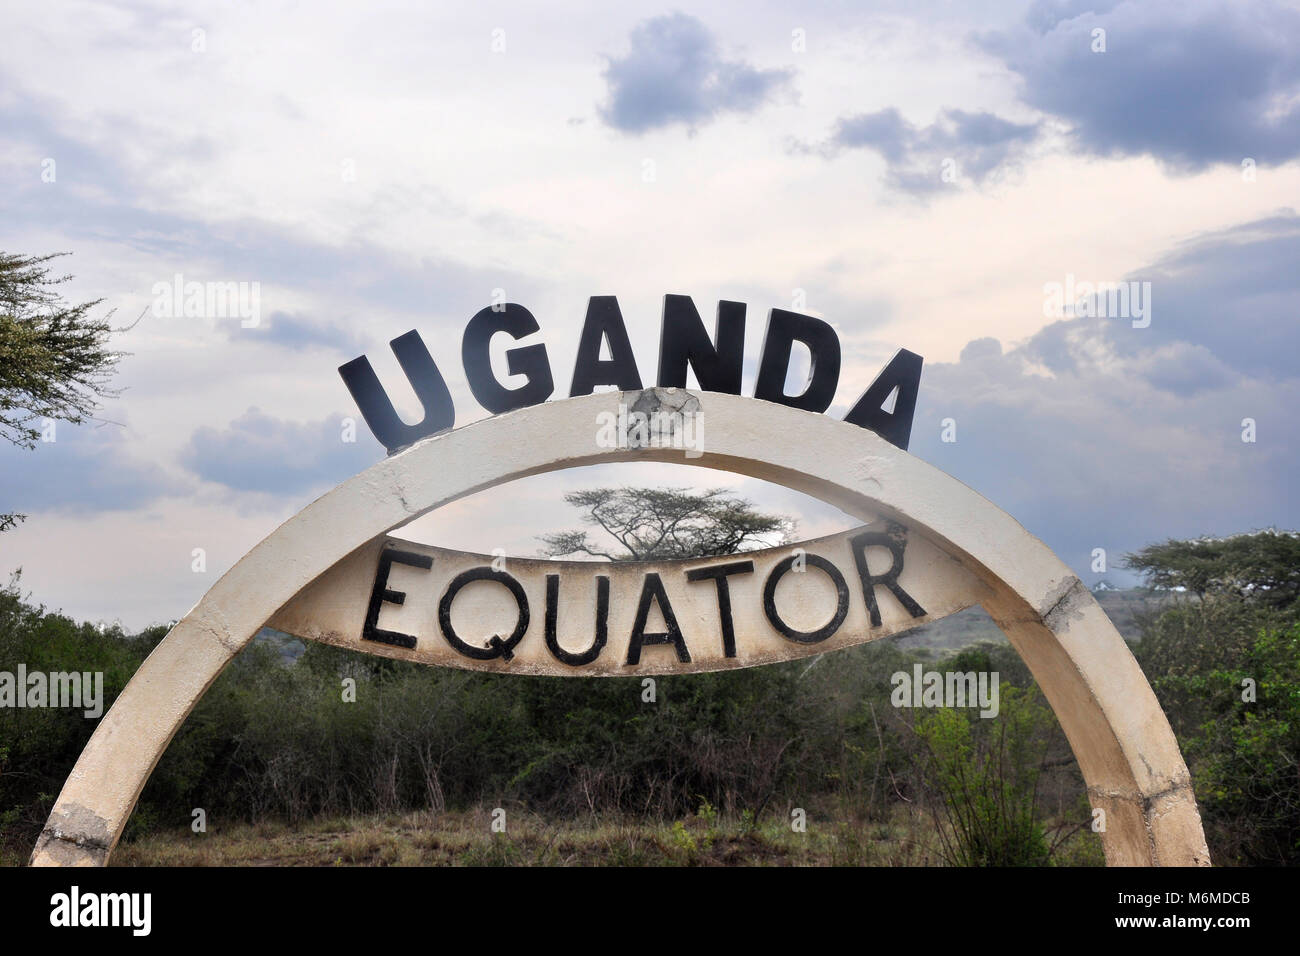 Uganda, Passing Equator Line - Stock Image